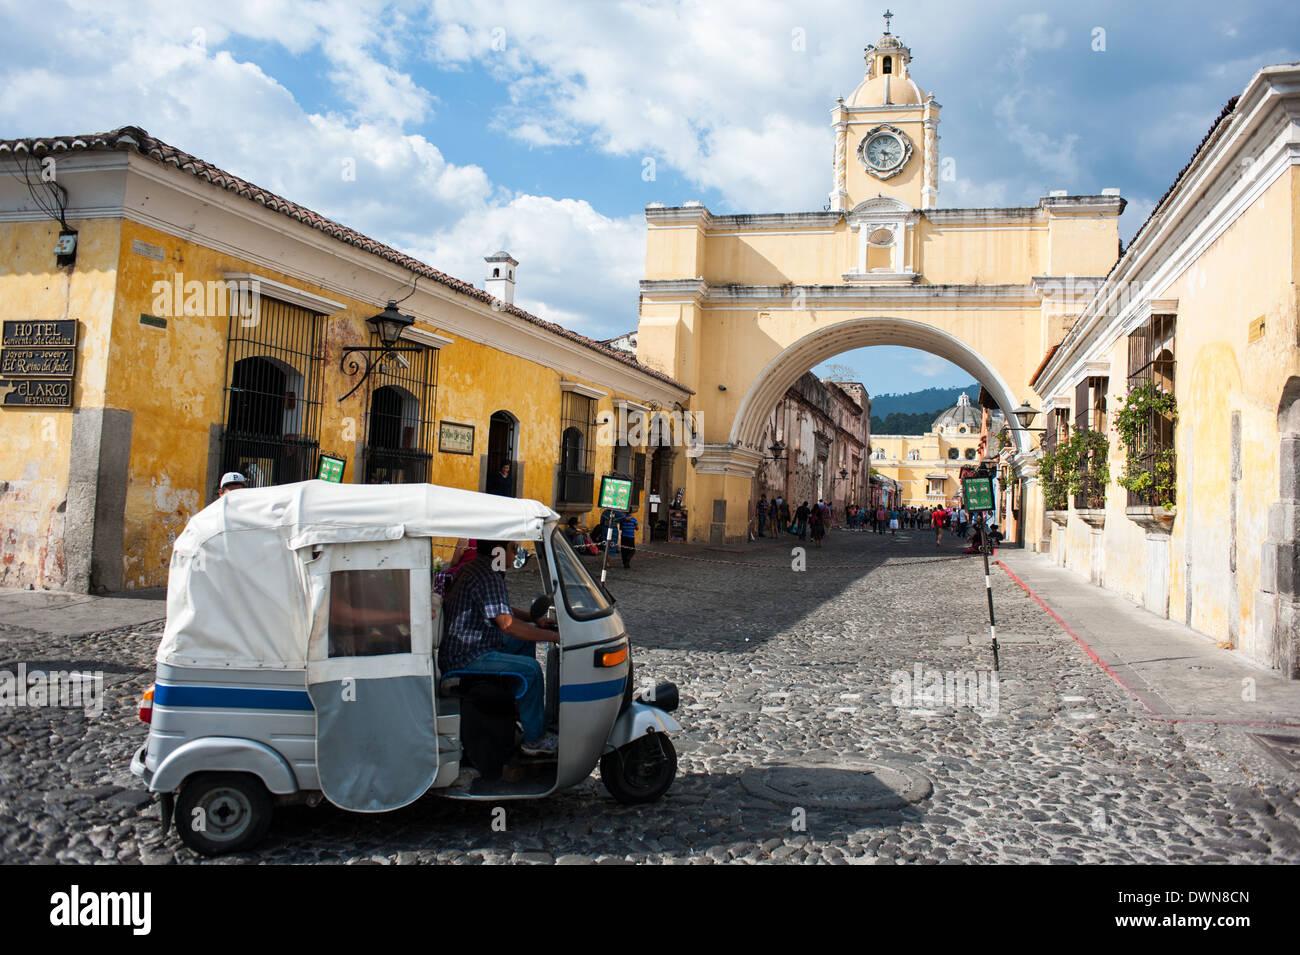 The Santa Catalina Arch in Antigua, Guatemala - Stock Image